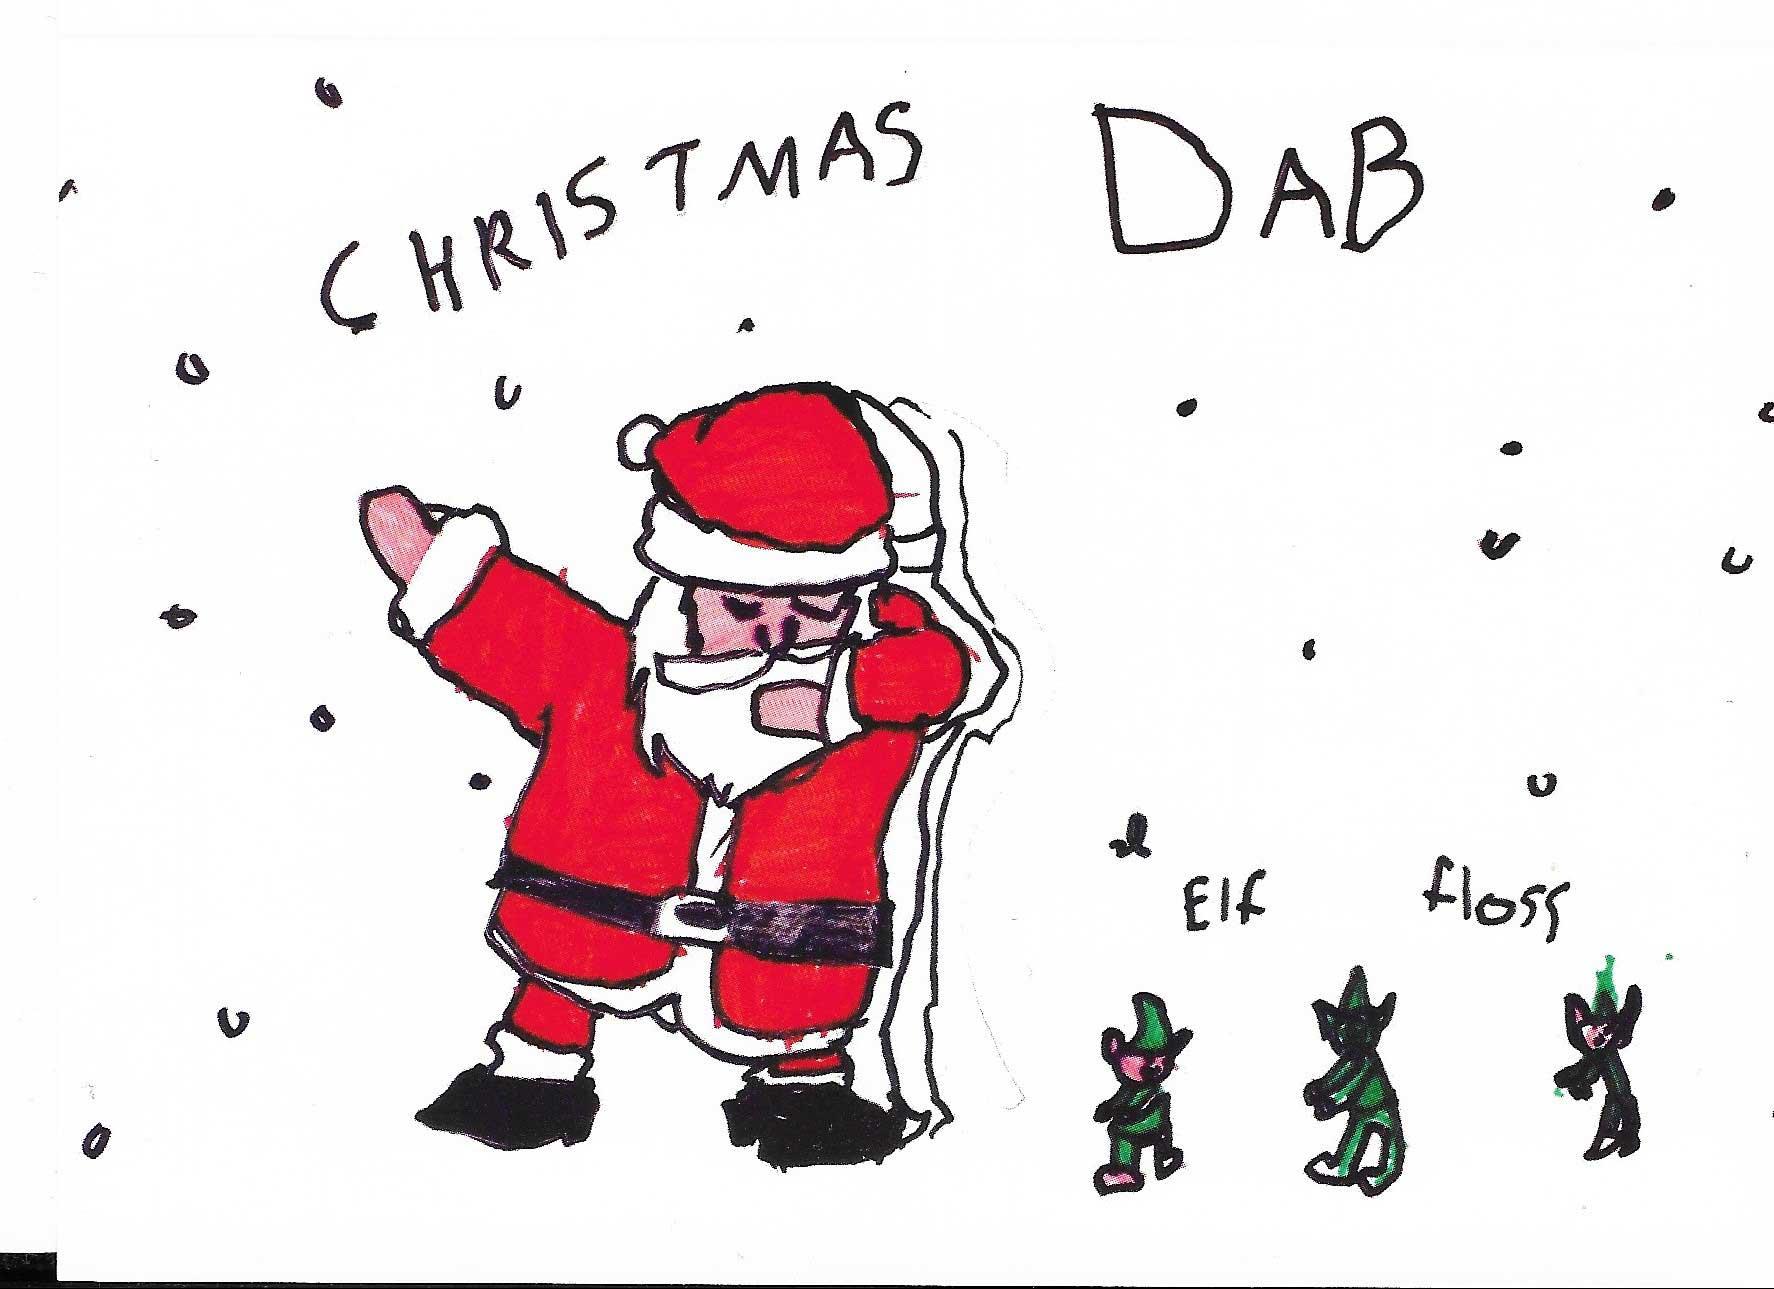 12.-Christmas-Dab-&-Elf-Floss_Tiziano